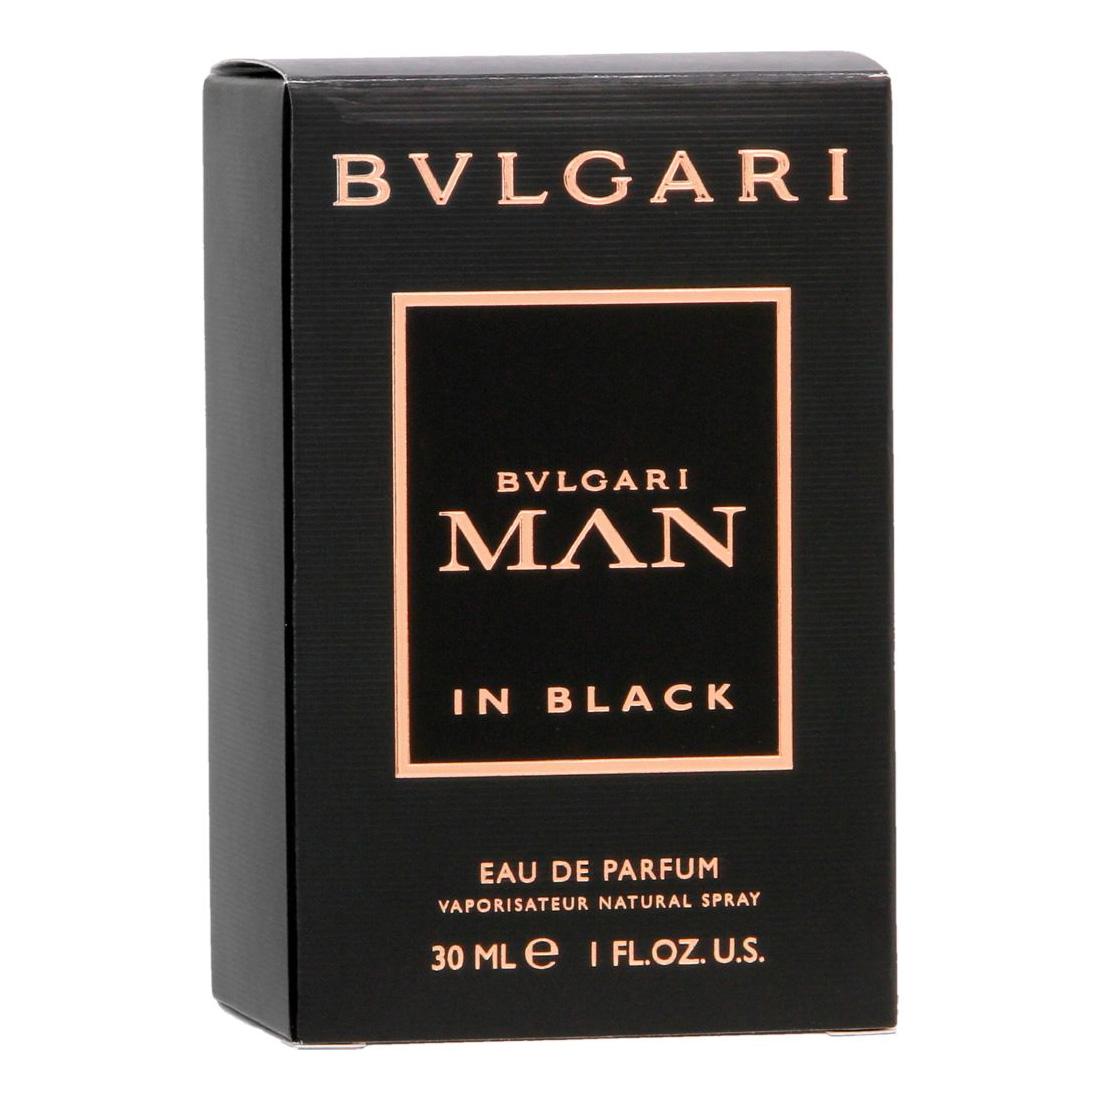 Bulgari Man in Black eau de parfum spray 30 ml